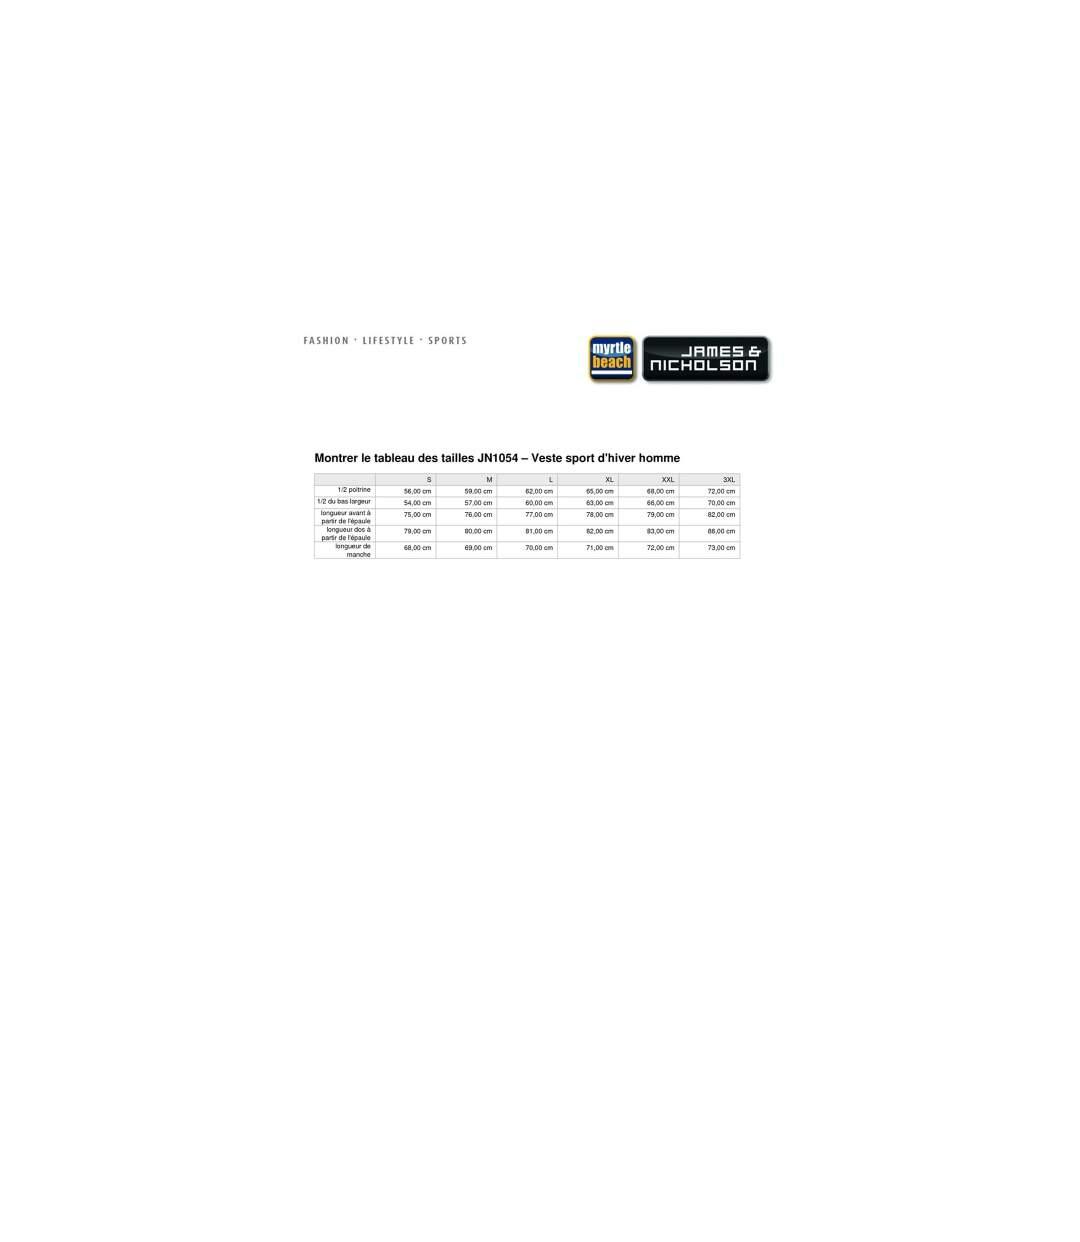 Veste softshell doublée - JN1054 - Vert - Homme - Sports d'hiver - Ski